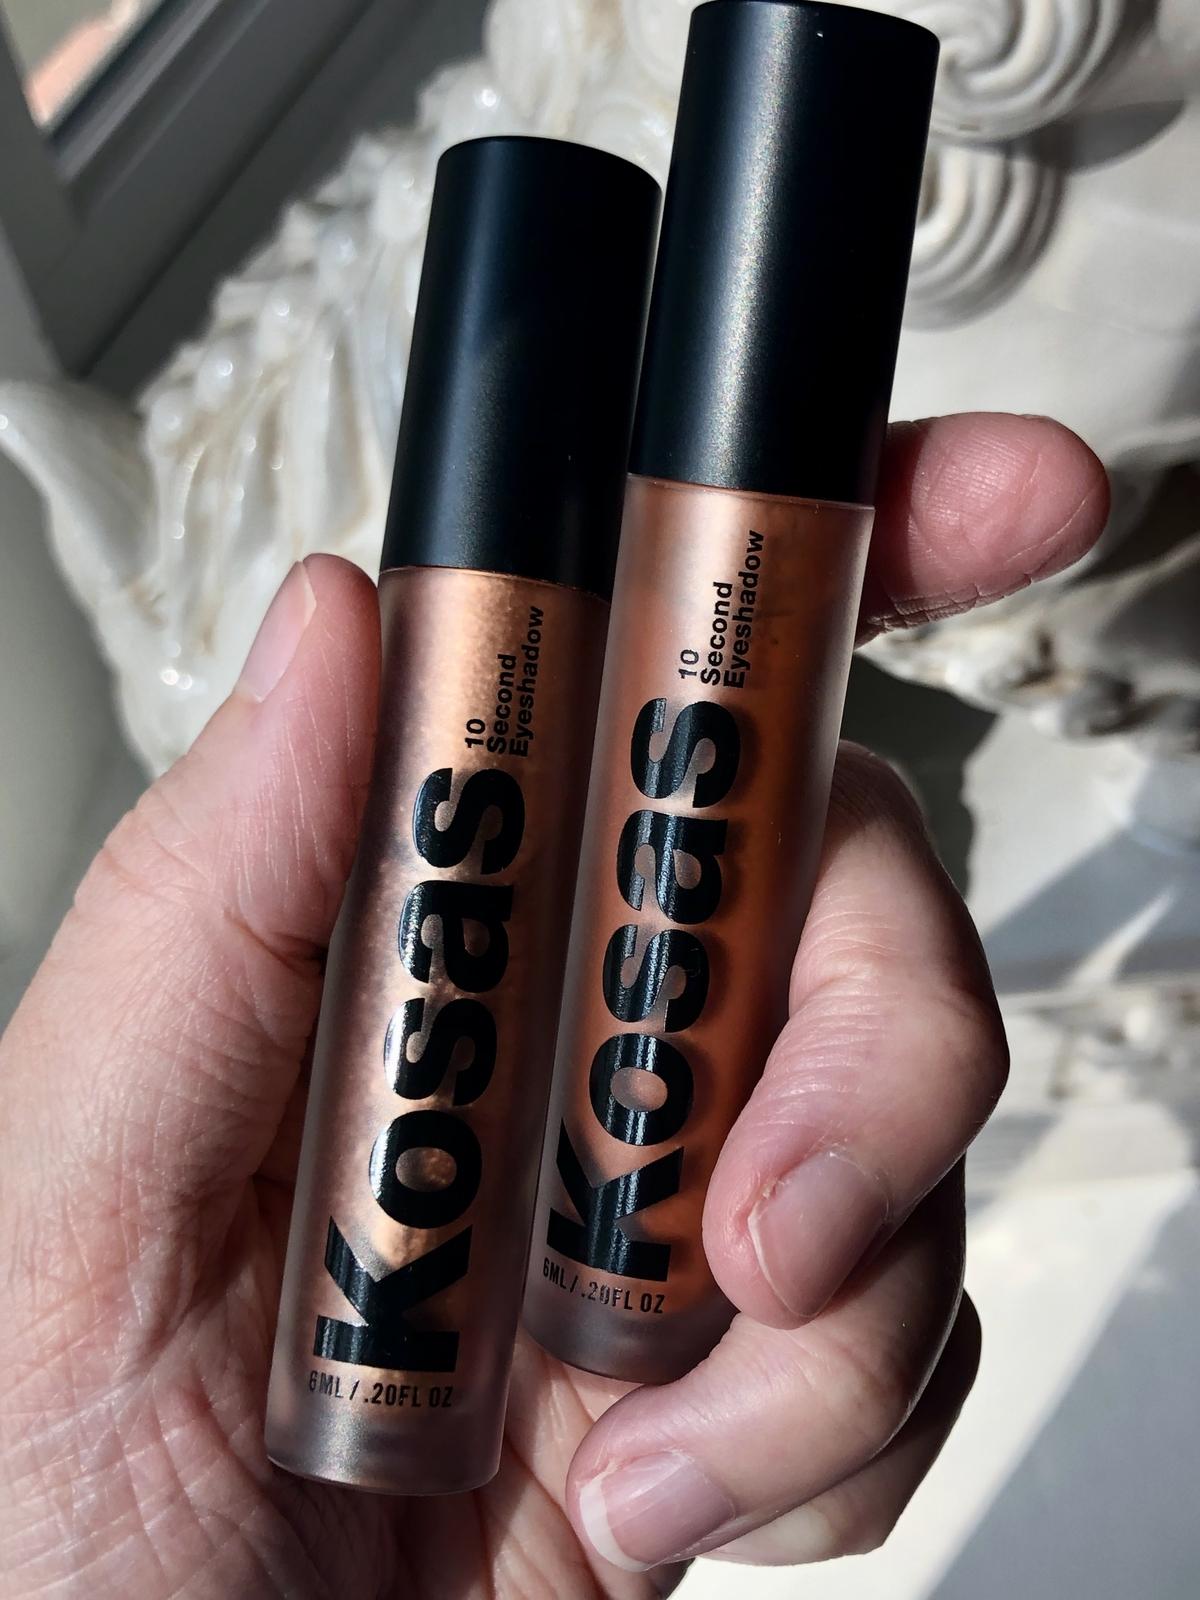 10 Second Liquid Eyeshadows from Kosas